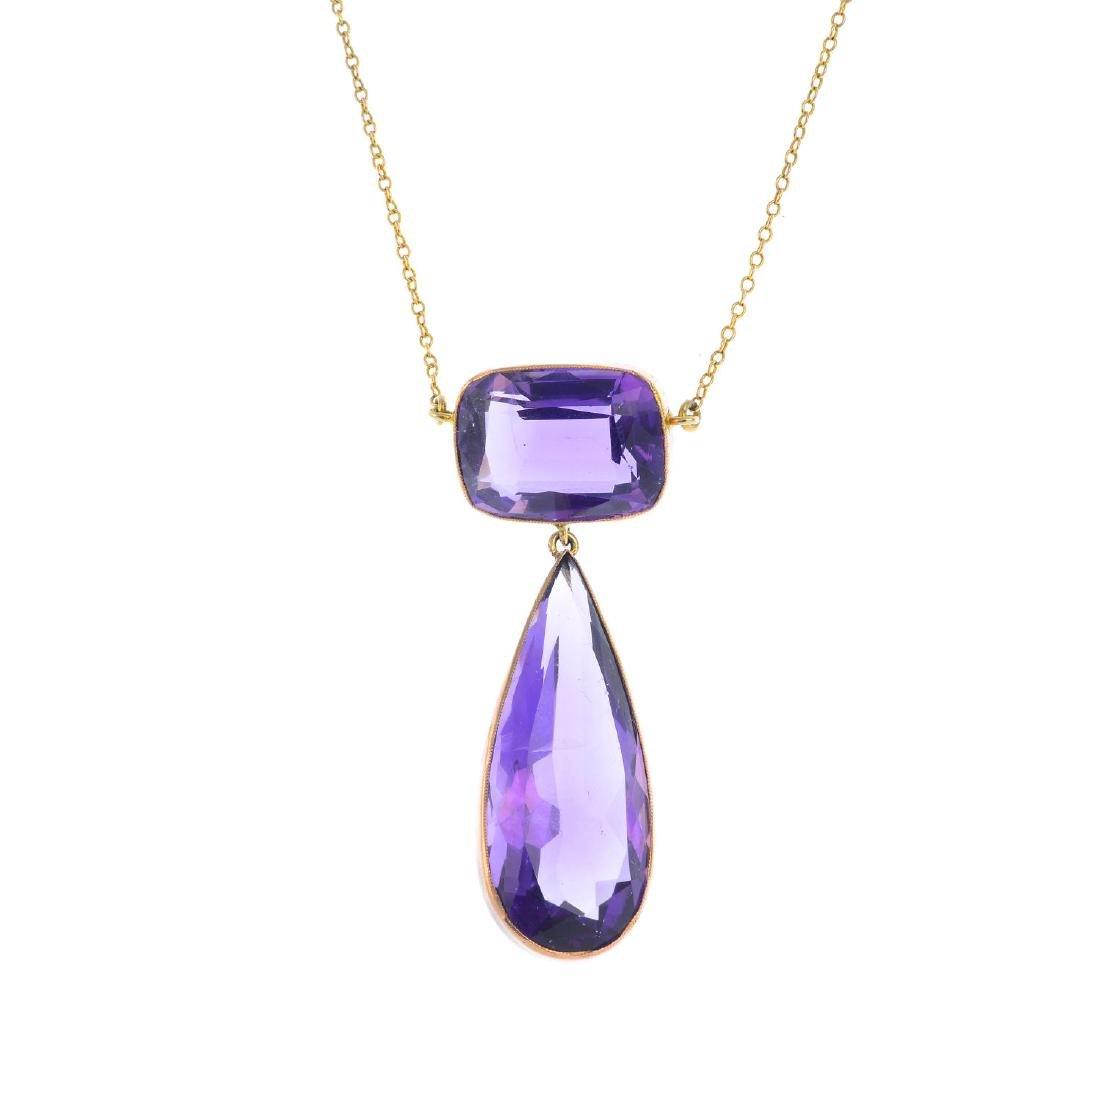 An amethyst pendant. The pear-shape amethyst collet,